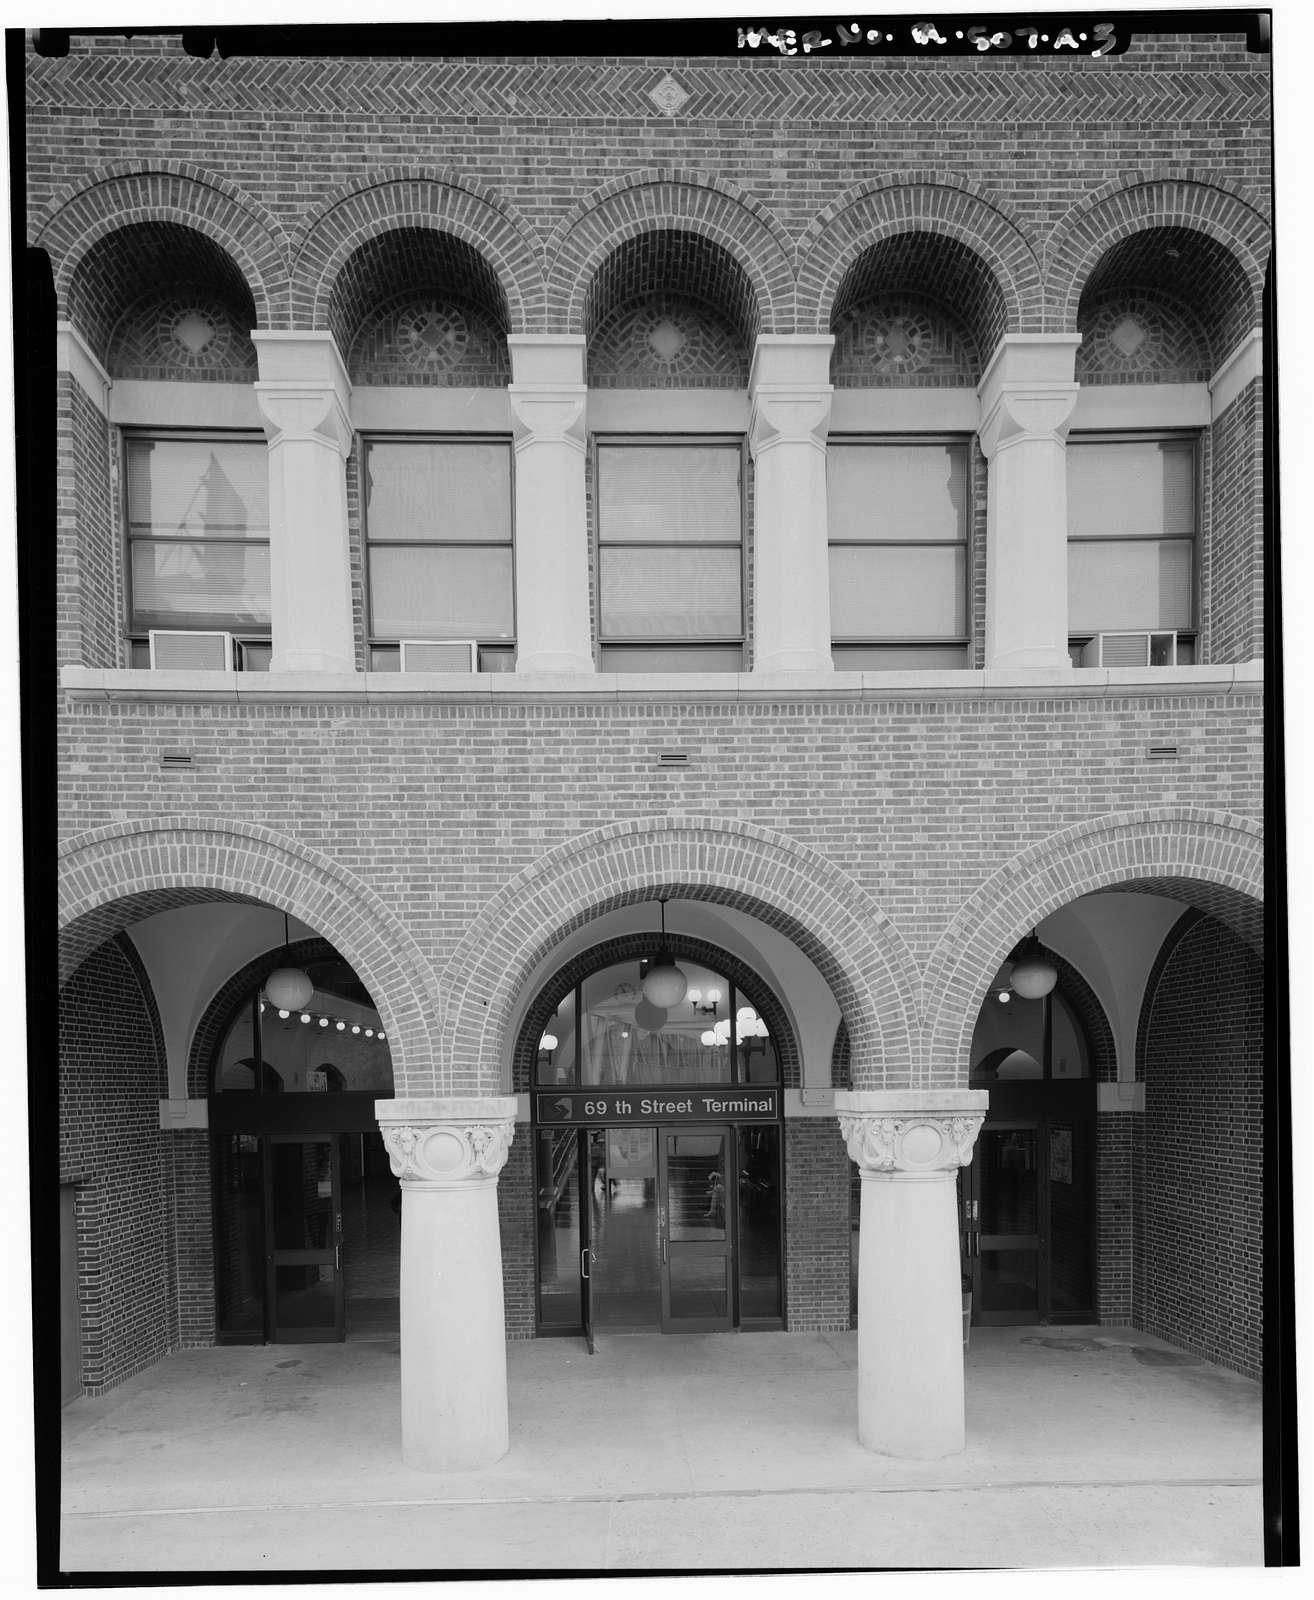 Market Street Elevated Railway, 69th Street Terminal, Market & Sixty-ninth Streets, Philadelphia, Philadelphia County, PA